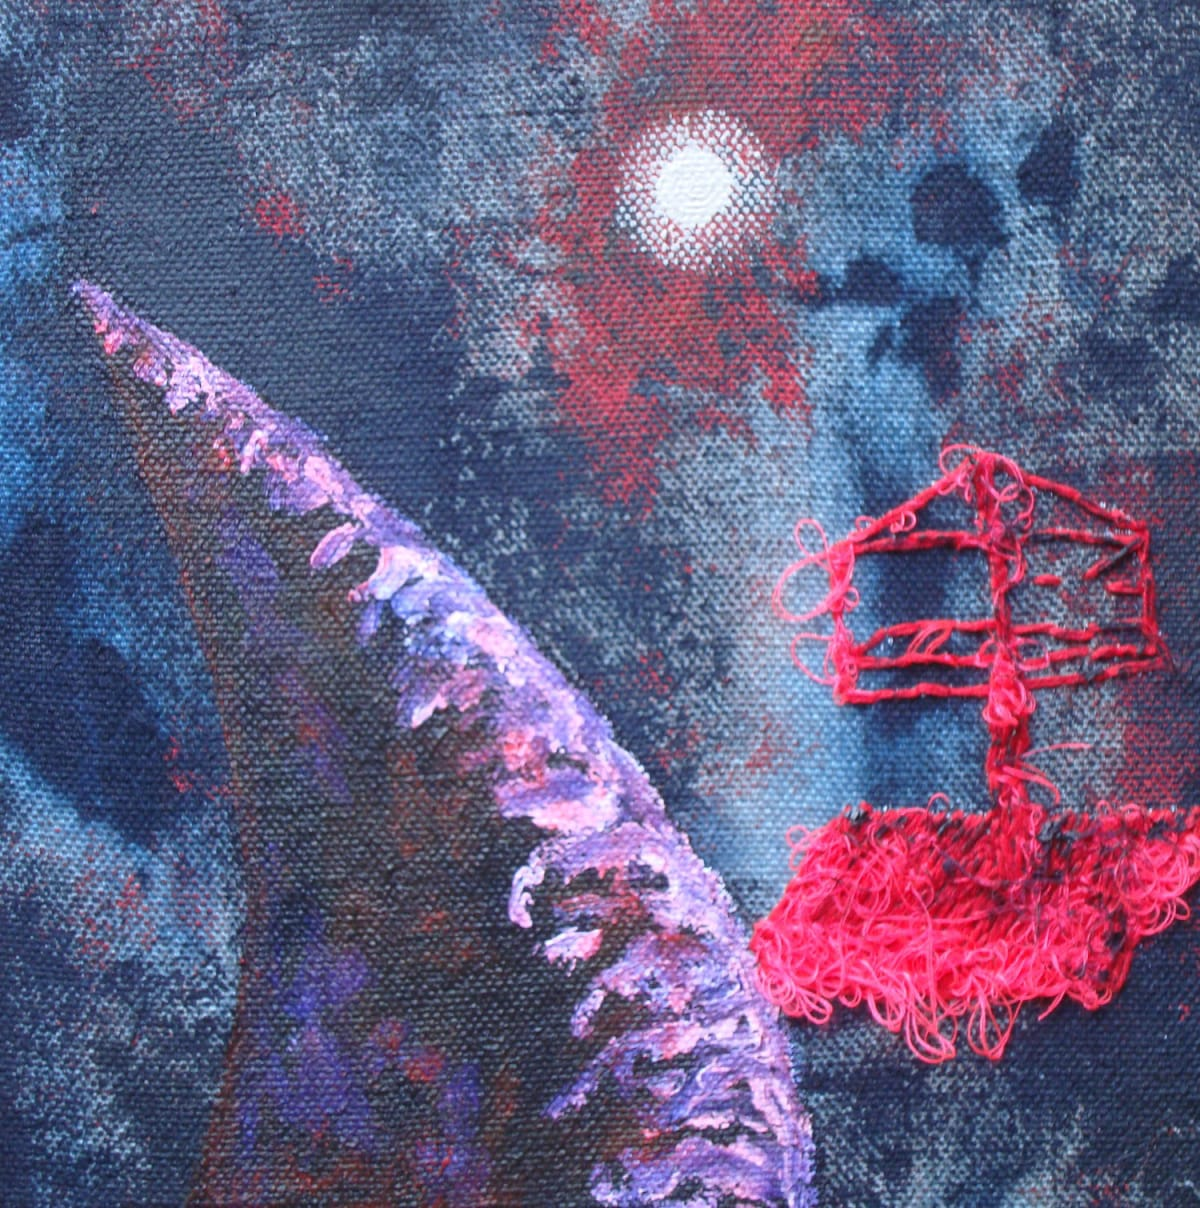 Stephen Eastaugh EMERGENCY CRAFT (RAFT) acrylic, thread, linen 23 x 23 cm